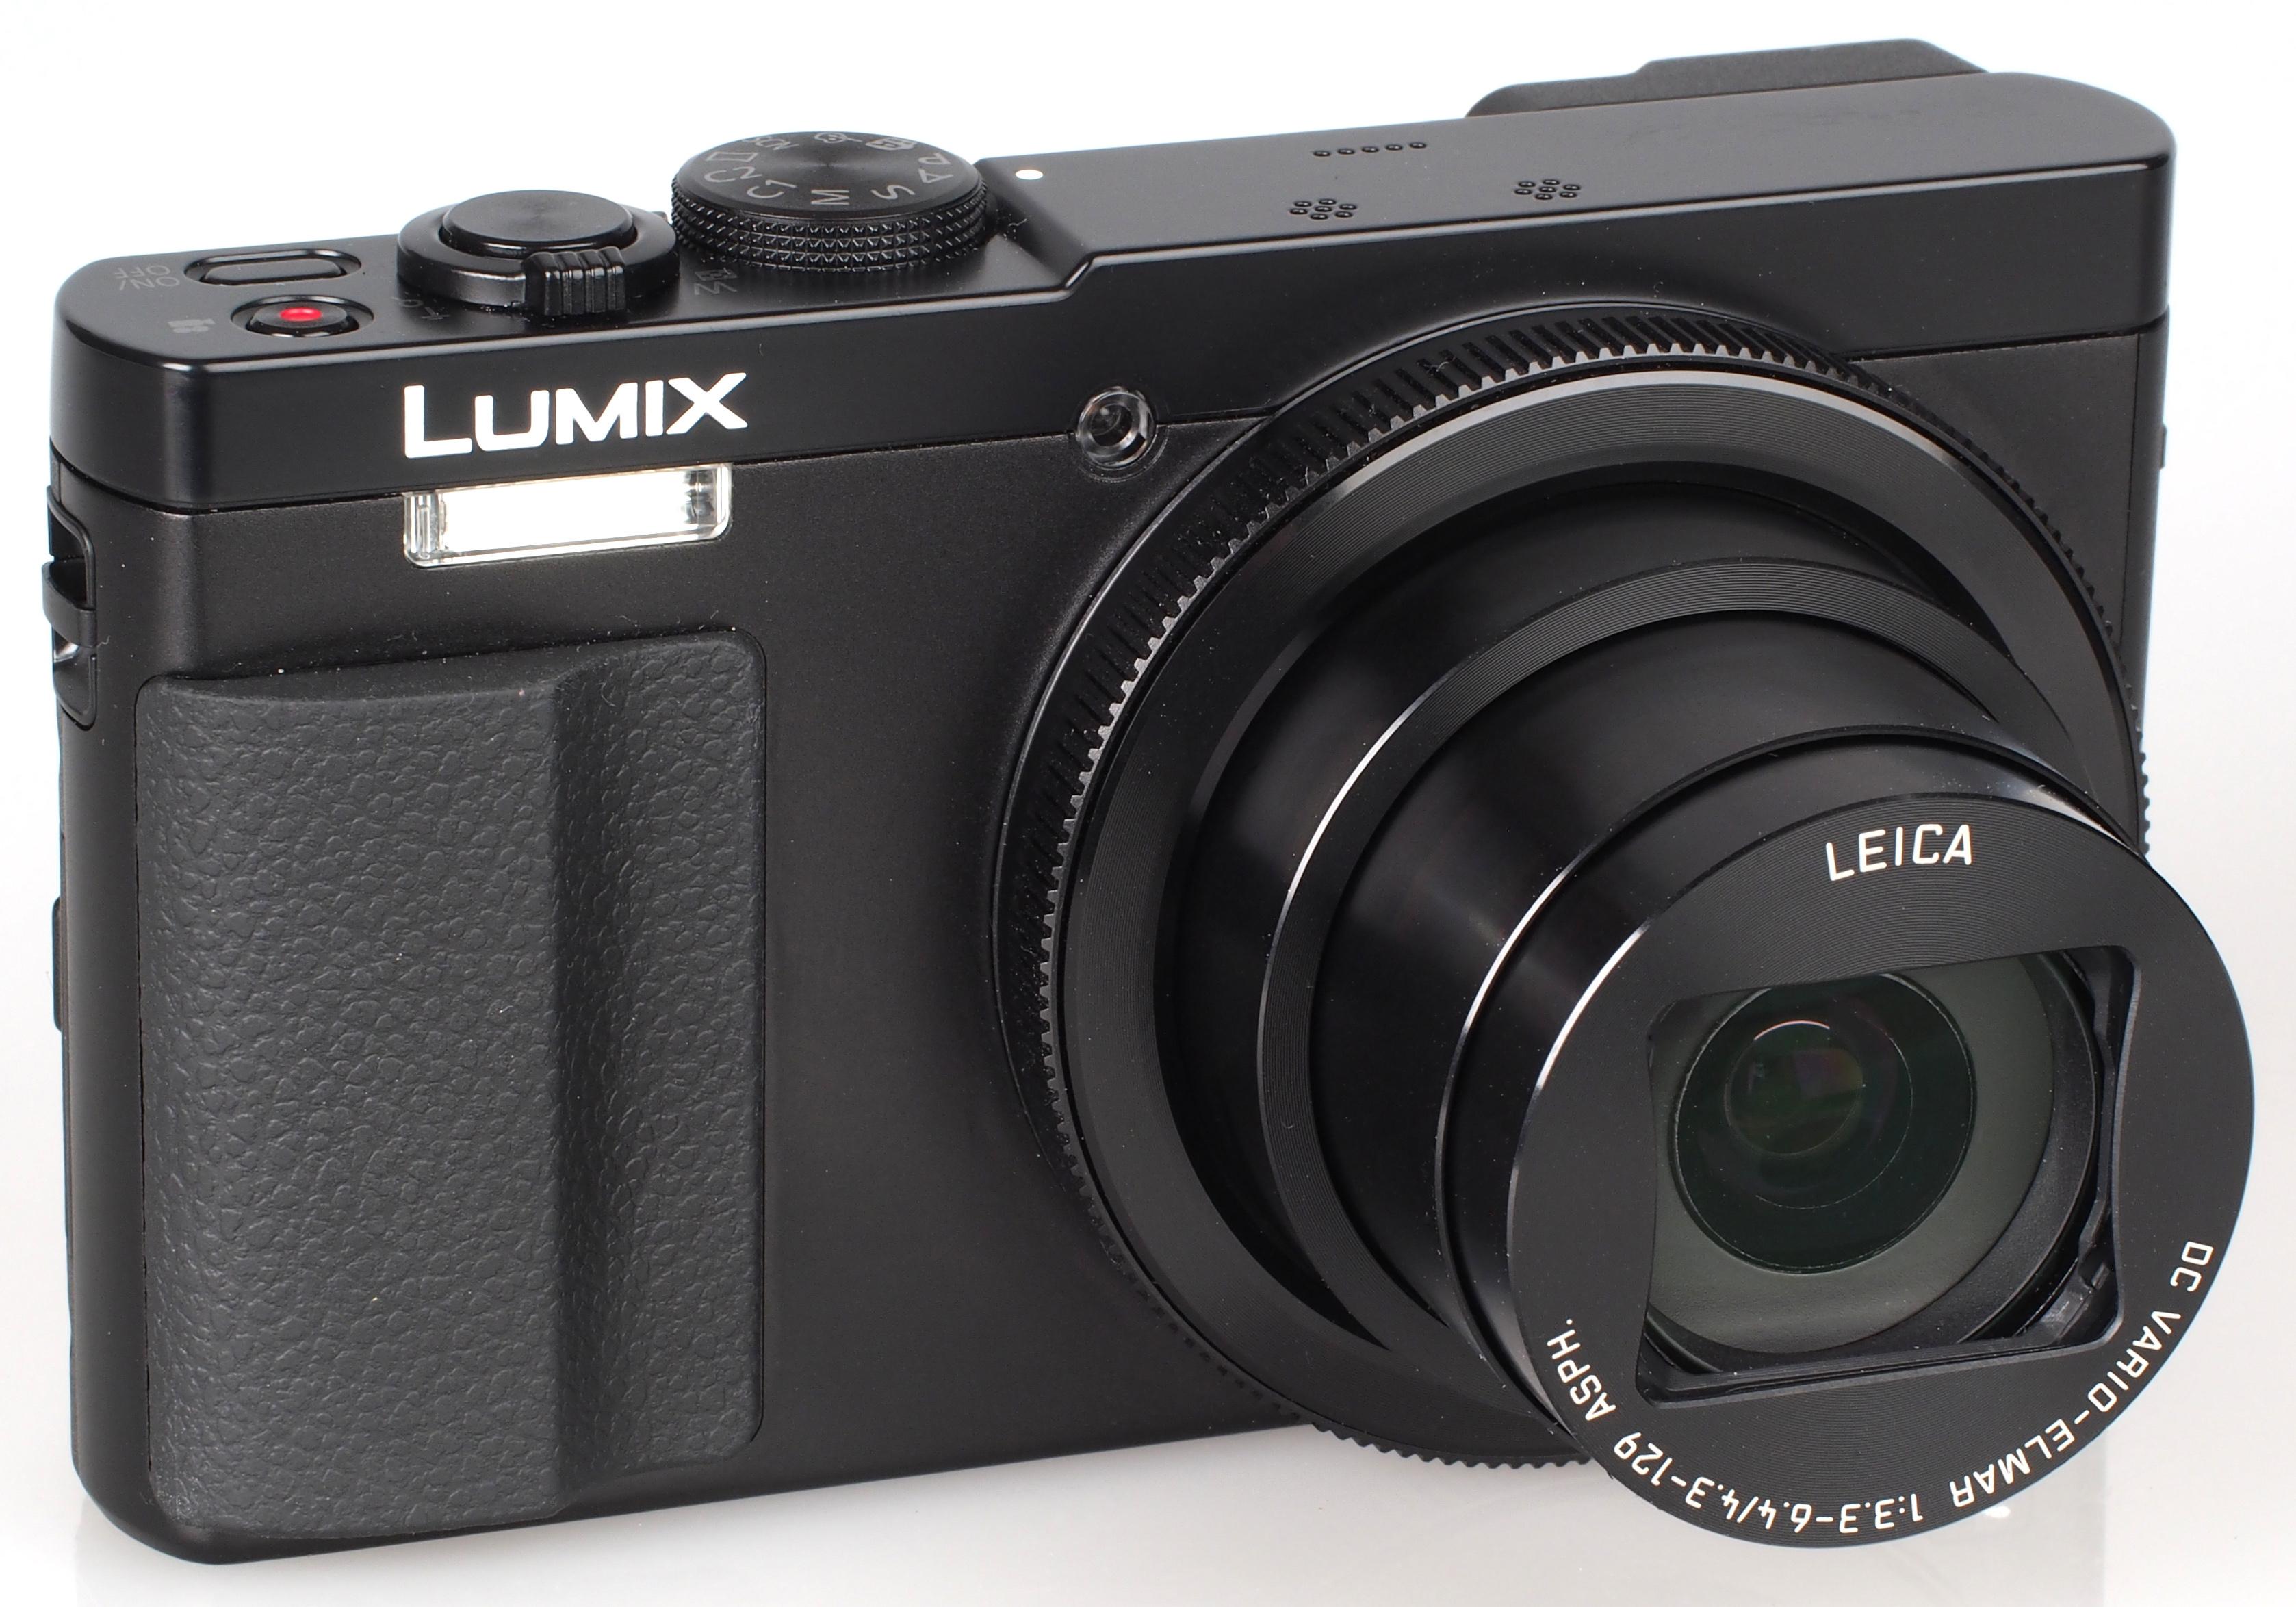 Panasonic Lumix DMC-TZ70 (ZS50) Review | ePHOTOzine